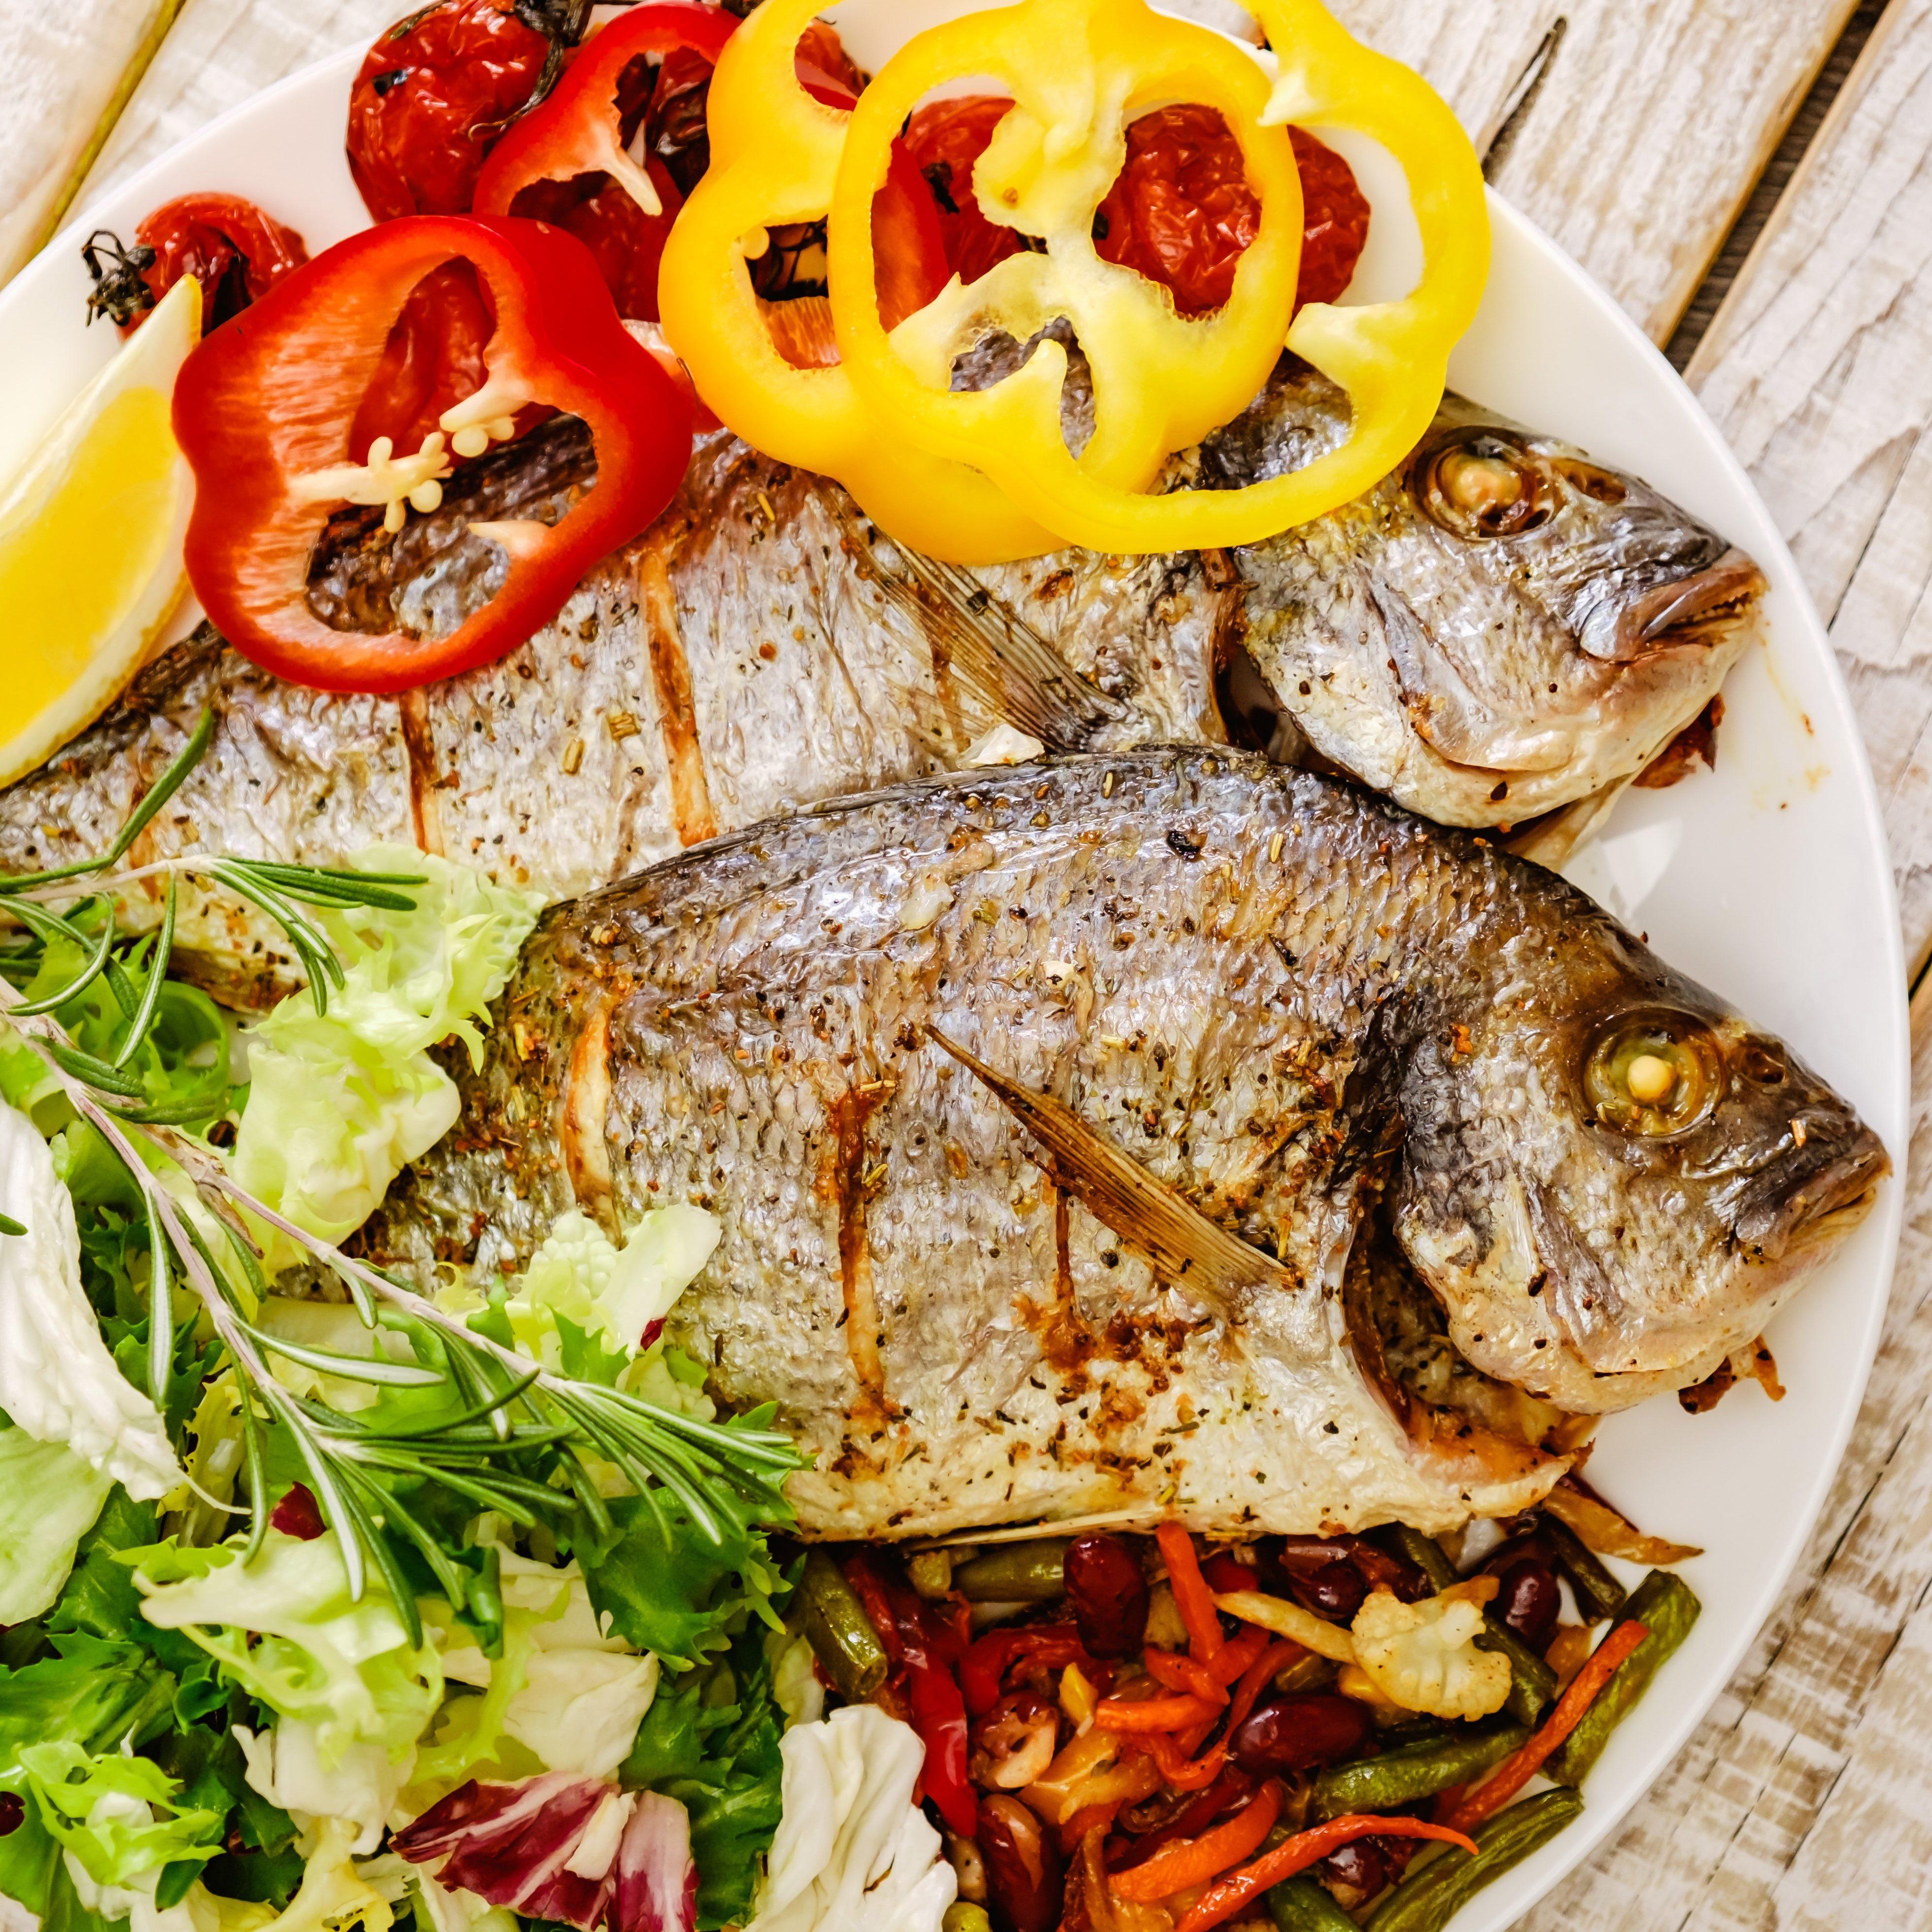 Food fish fresh dorado, meal seafood dinner with vegetables, diet gourmet.